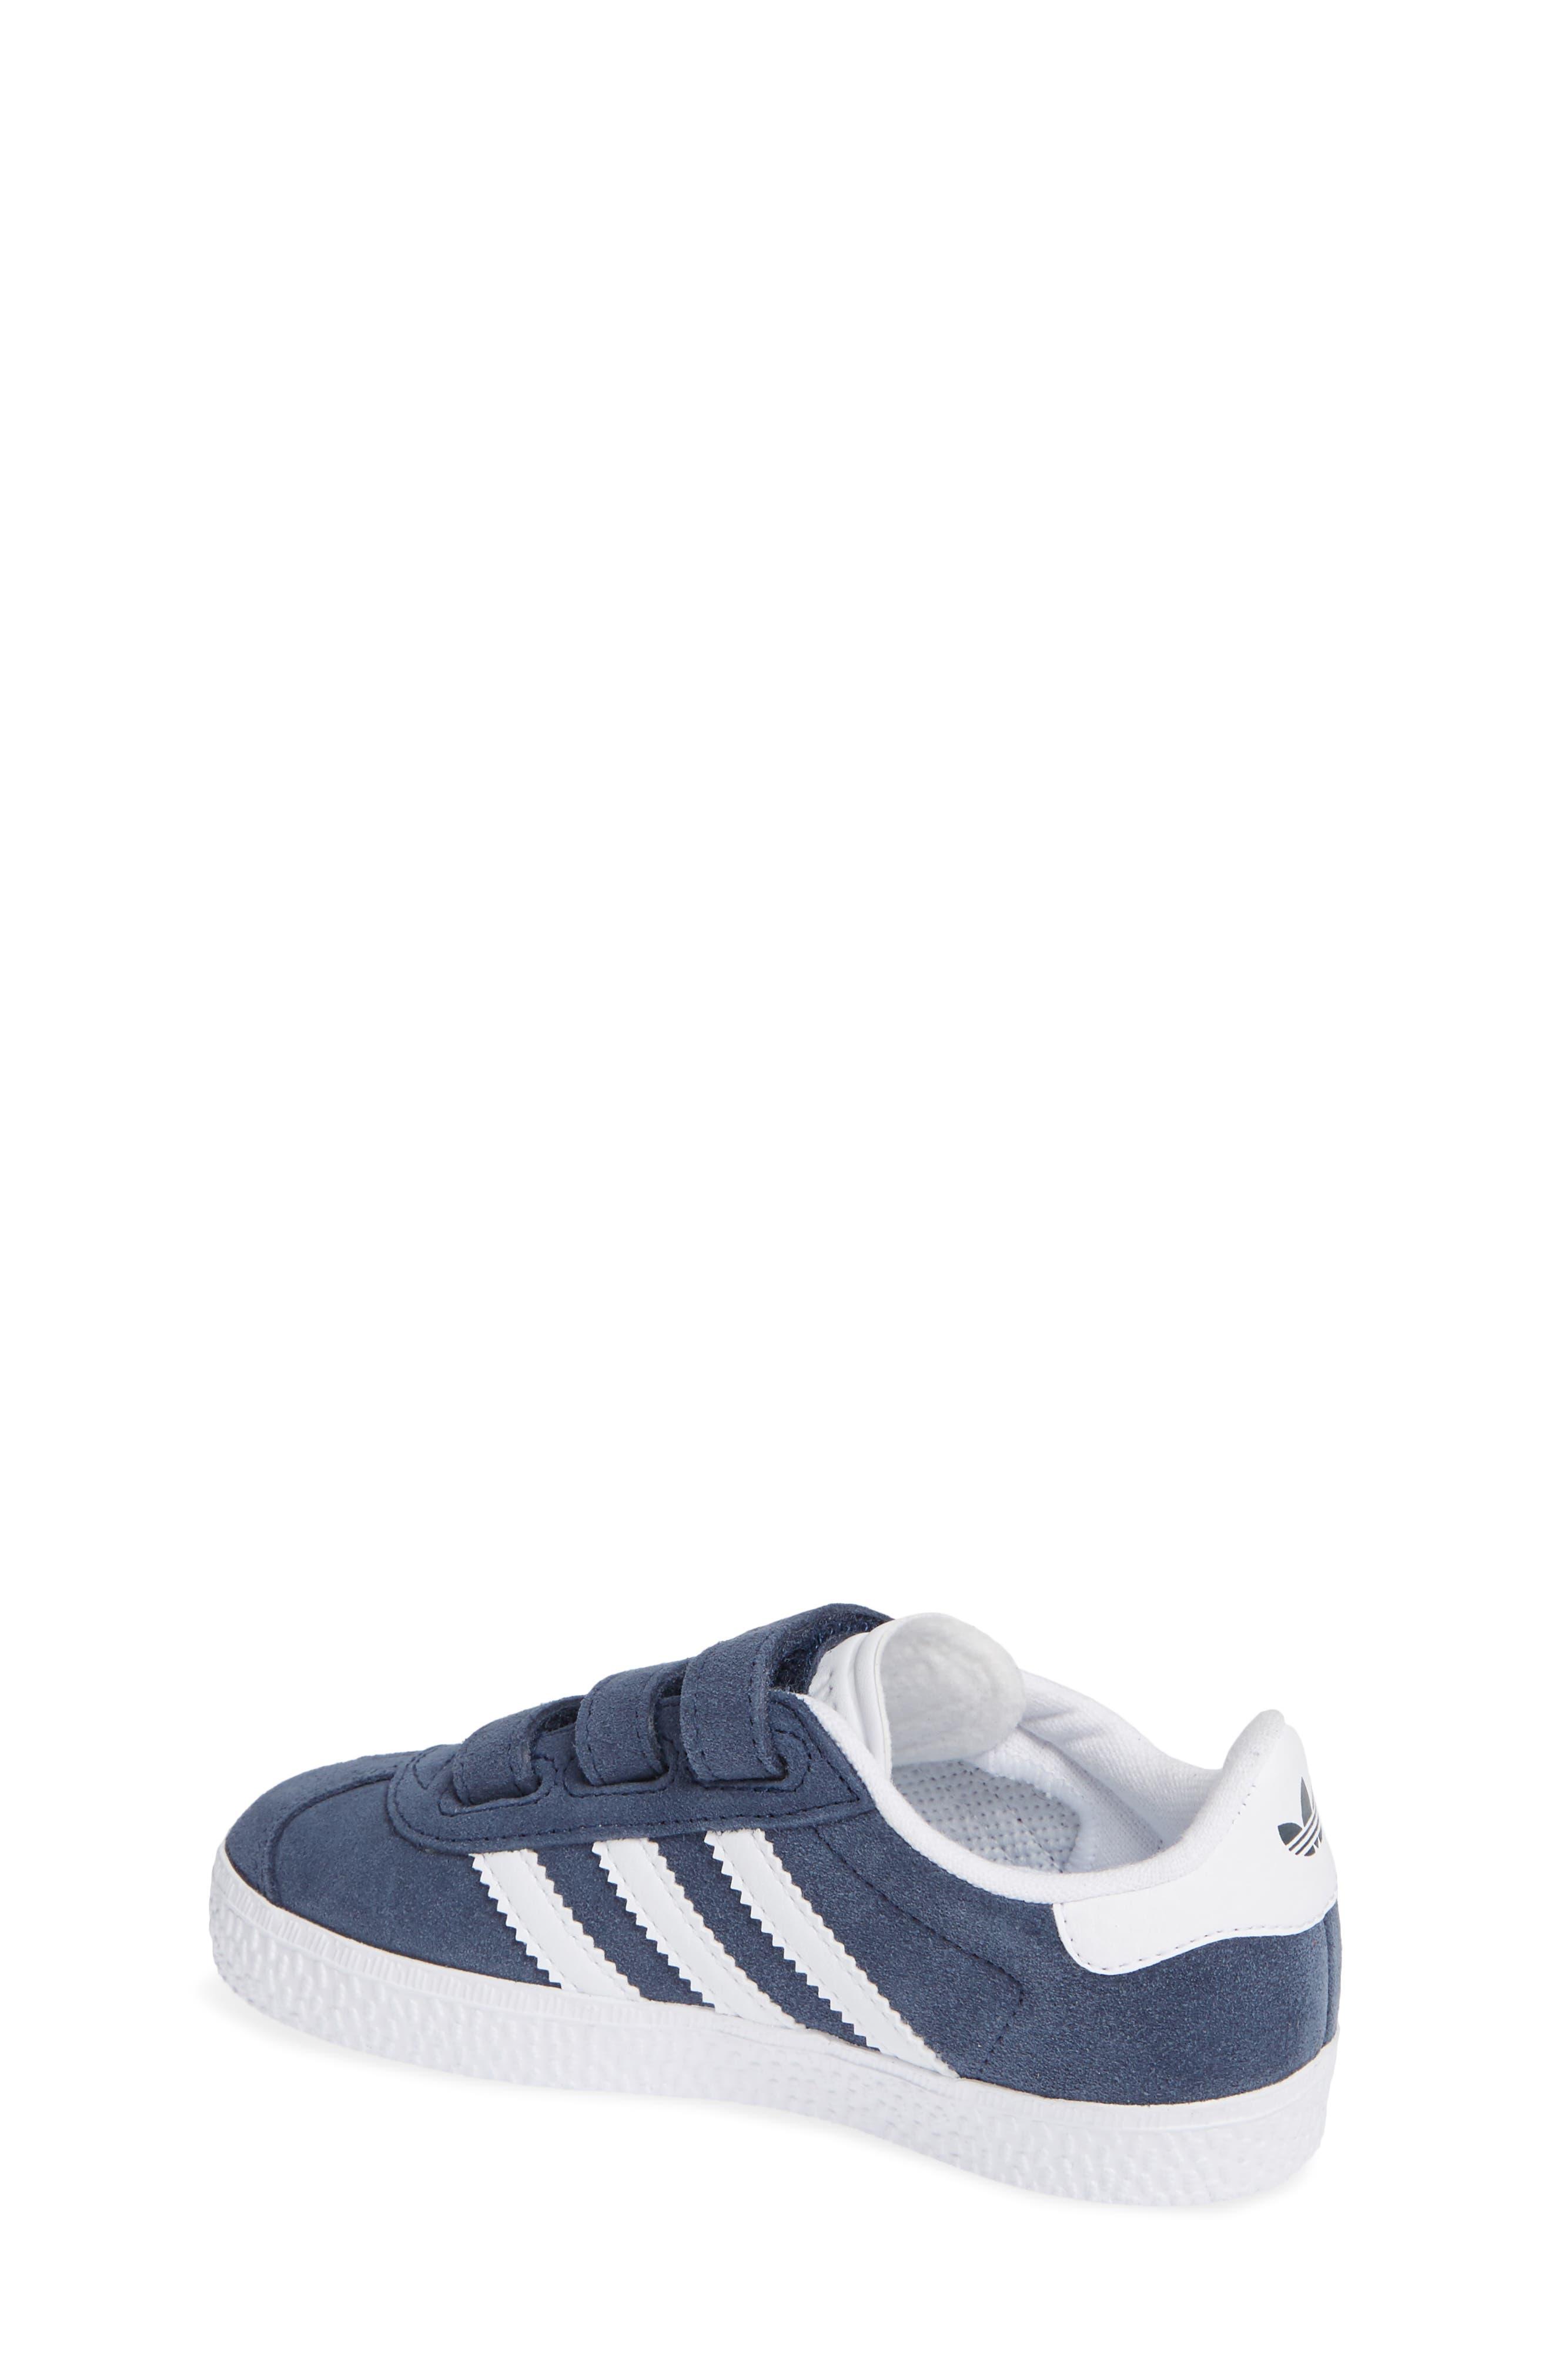 ADIDAS, Gazelle Sneaker, Alternate thumbnail 2, color, NAVY/ WHITE